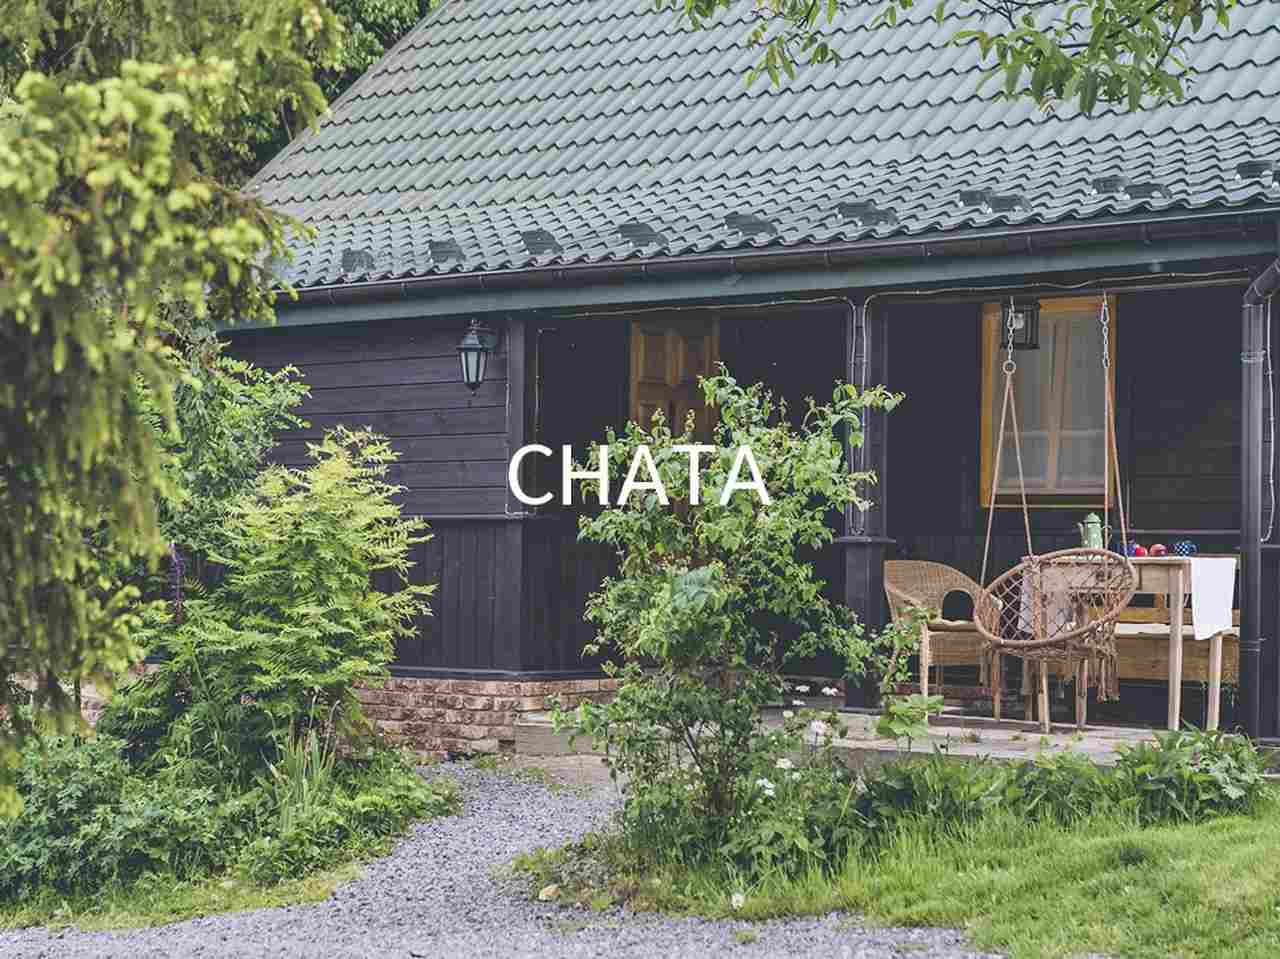 chata kafel_Easy-Resize.com